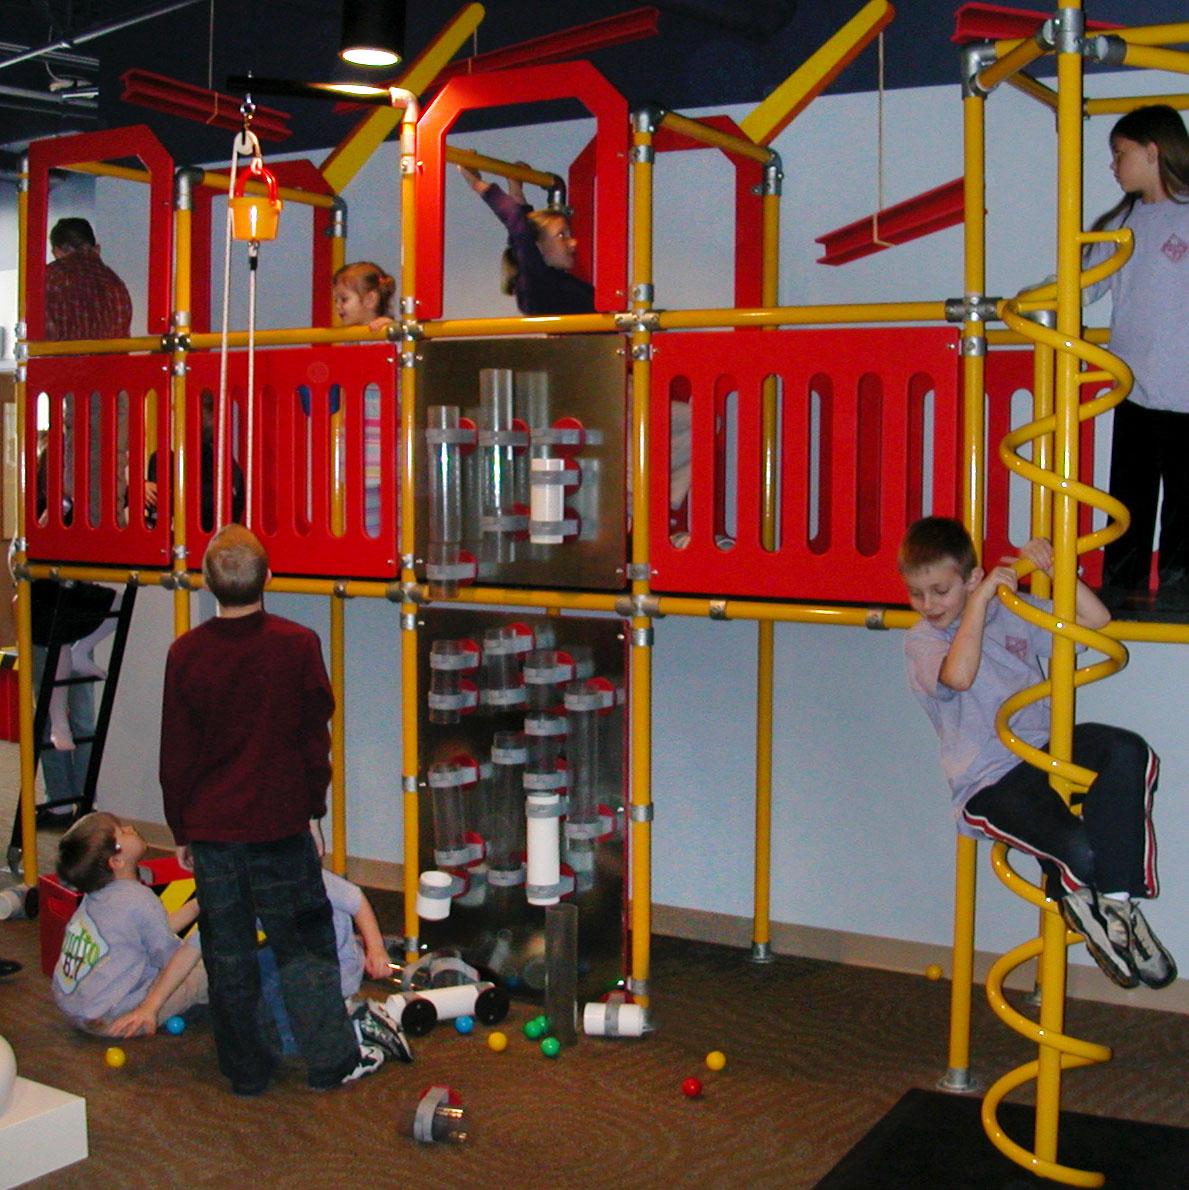 Construction Climber - $20,650